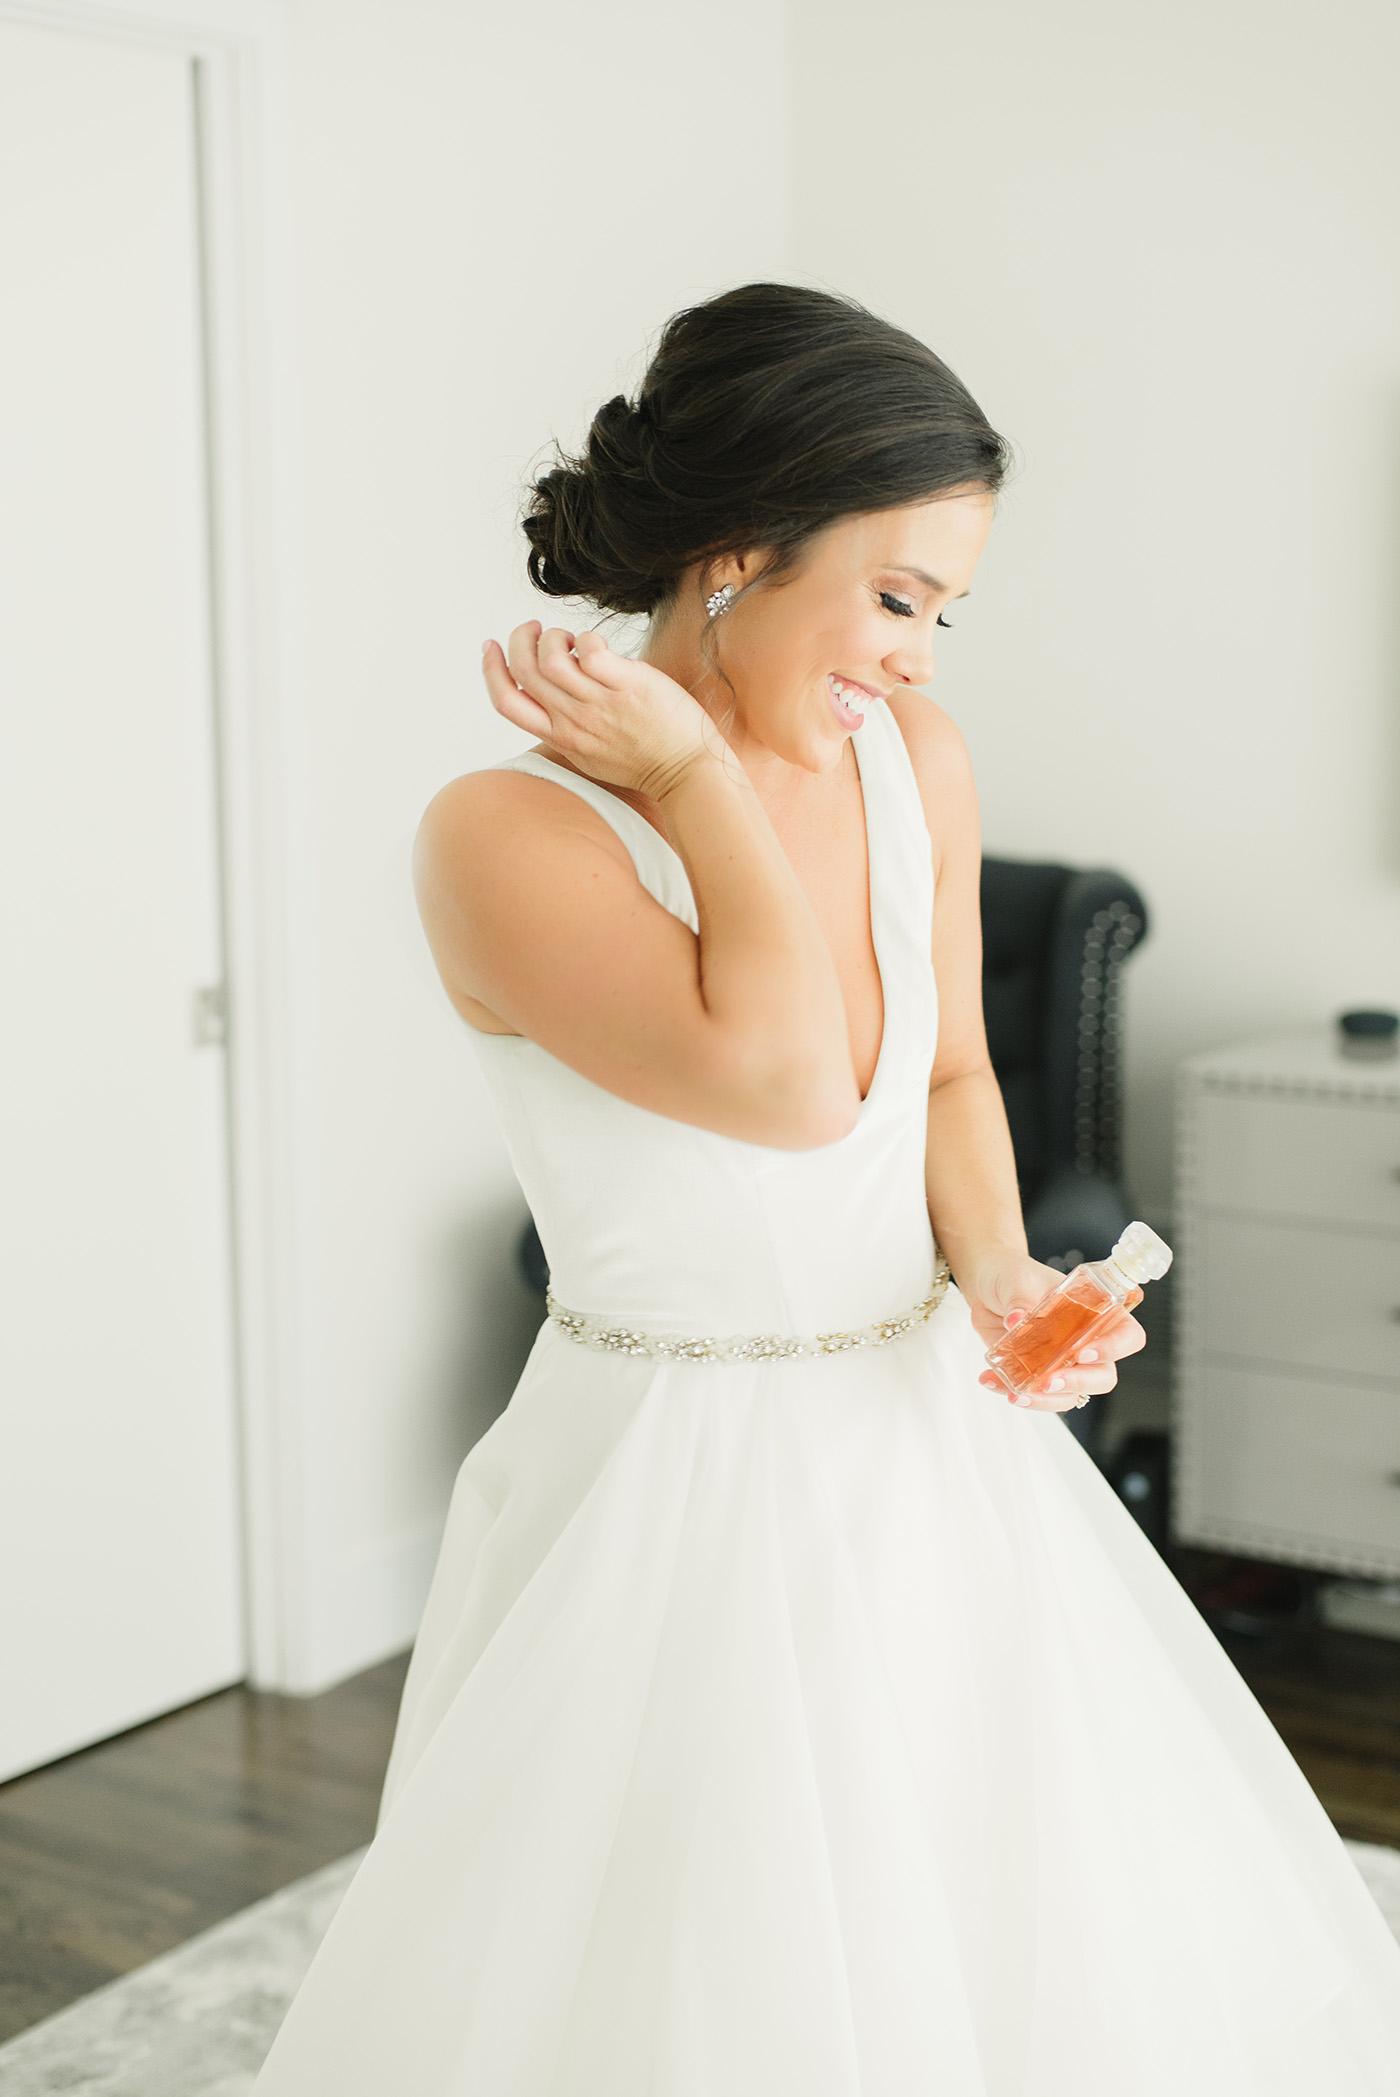 Dallas Wedding Planner - Winter Wedding at The Room on Main - Allday Events - 76.jpg